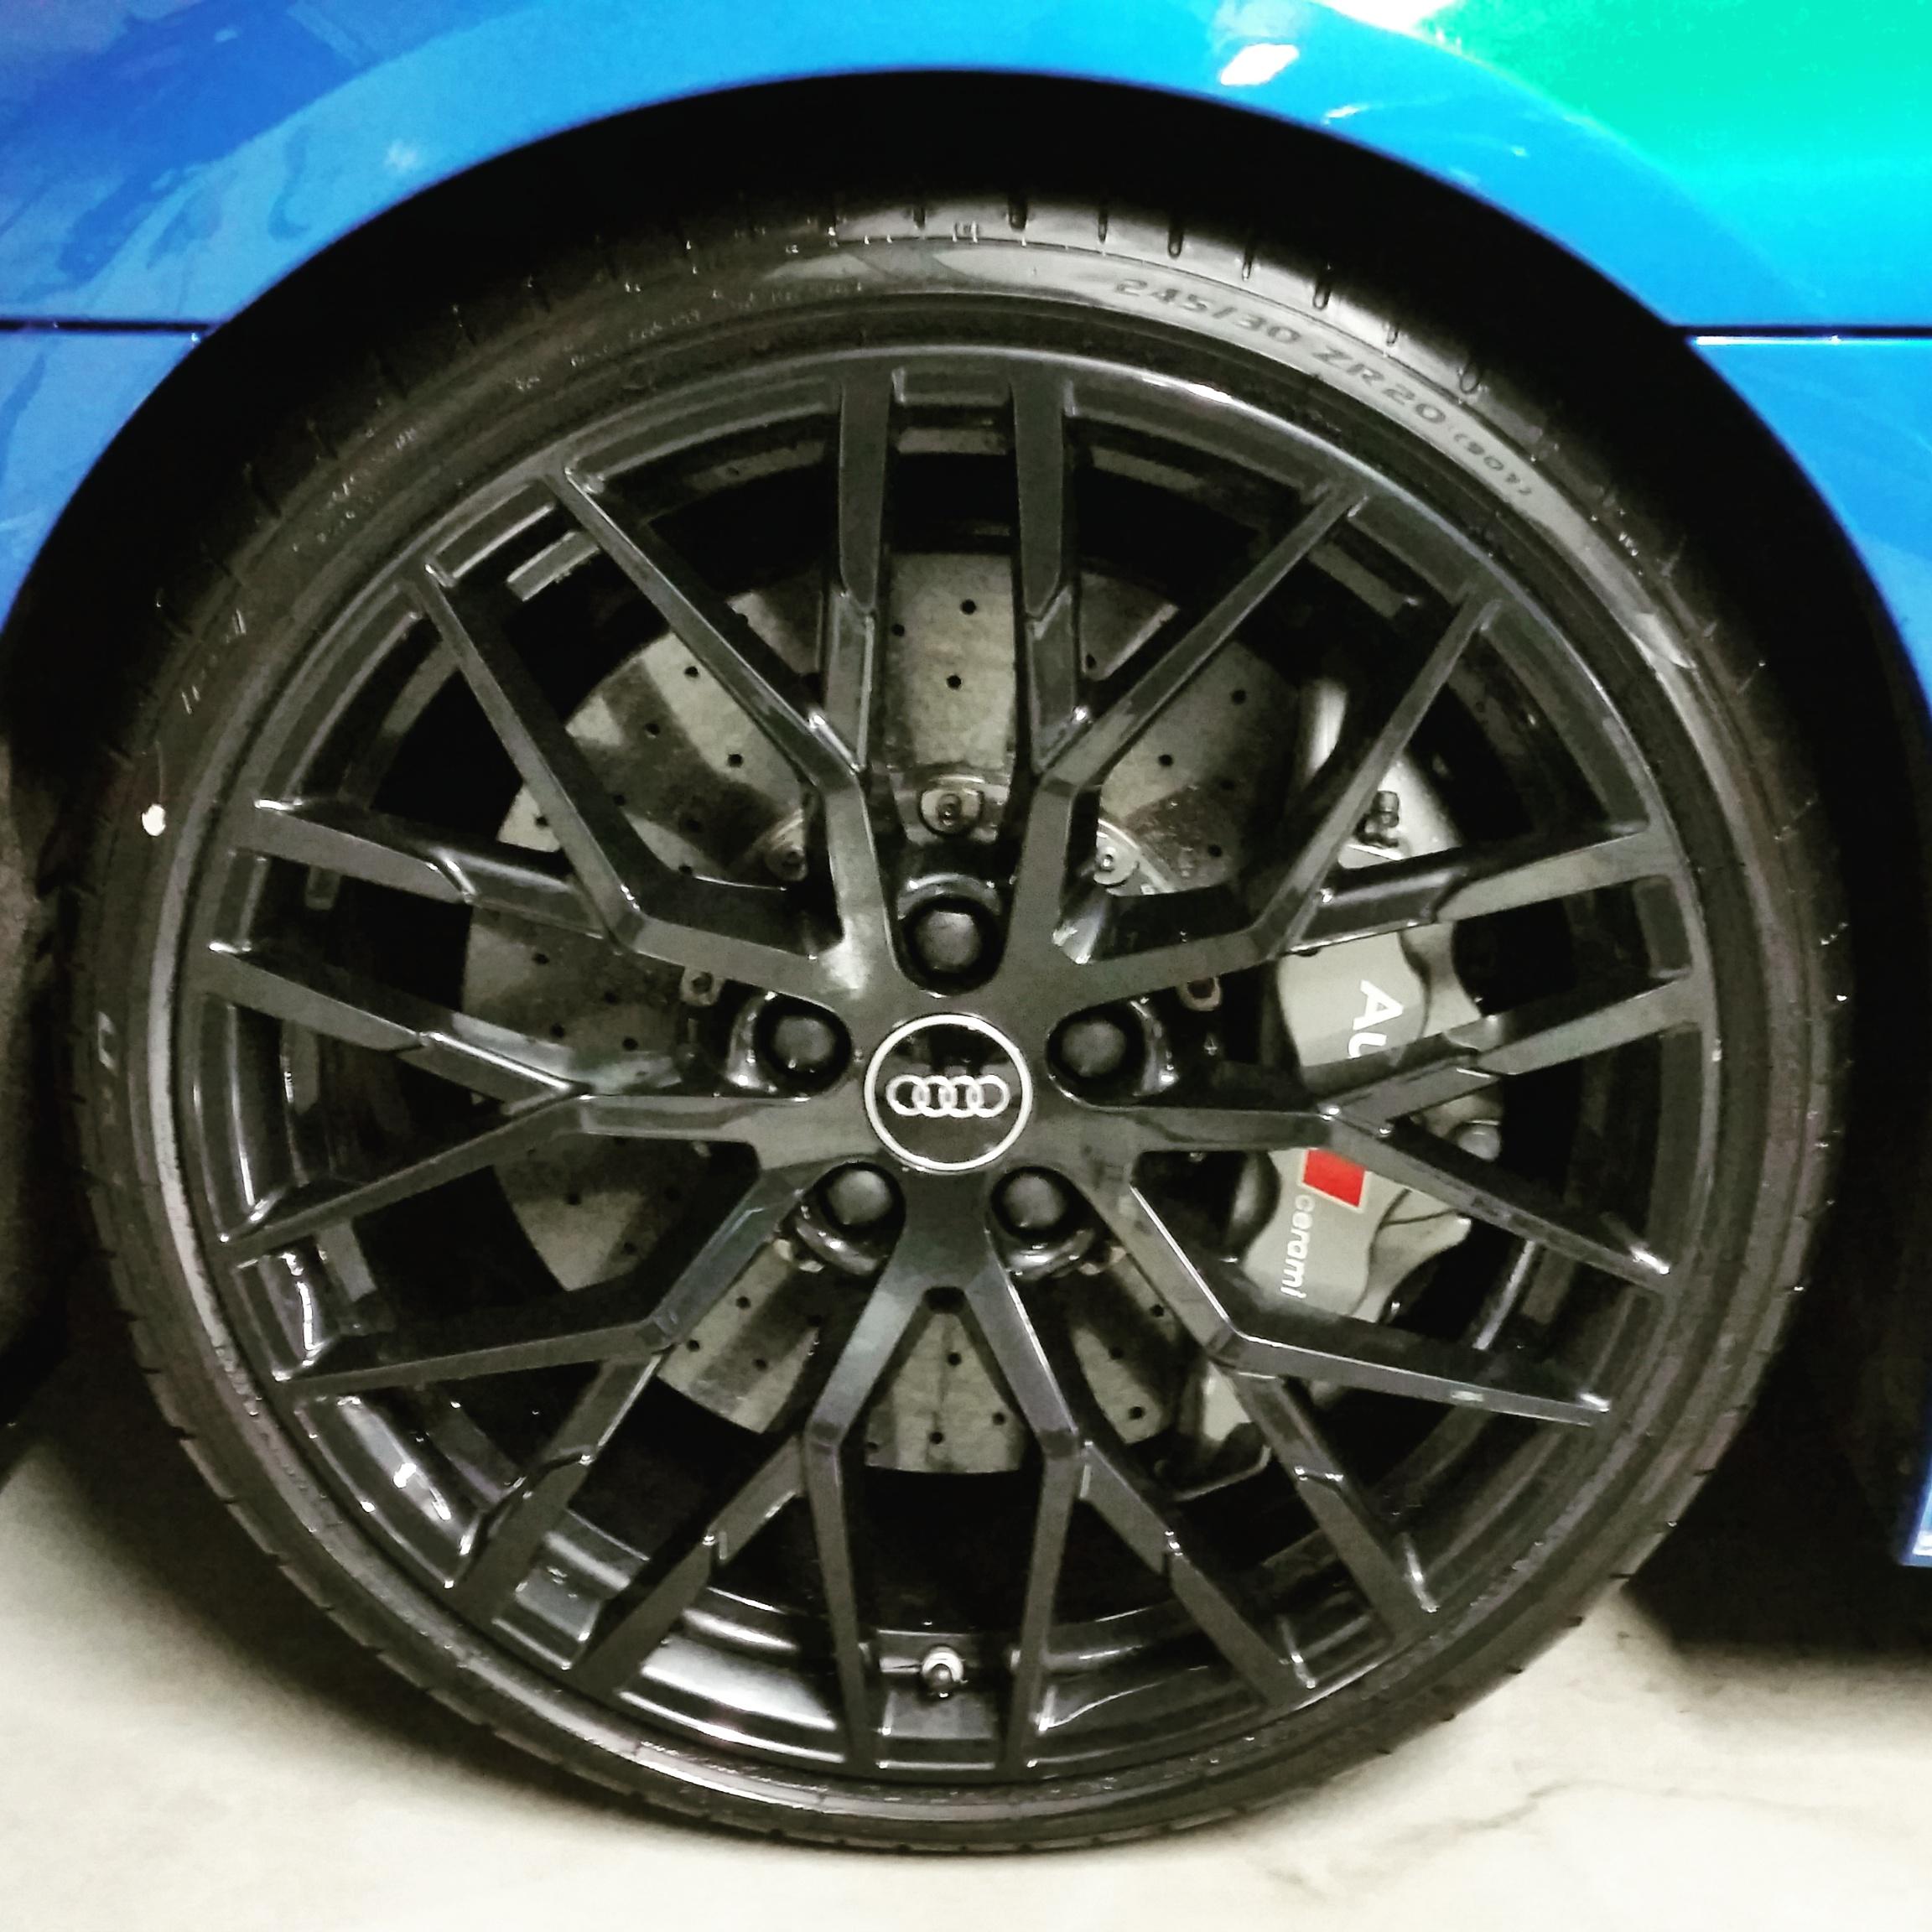 Audi R8 wheel